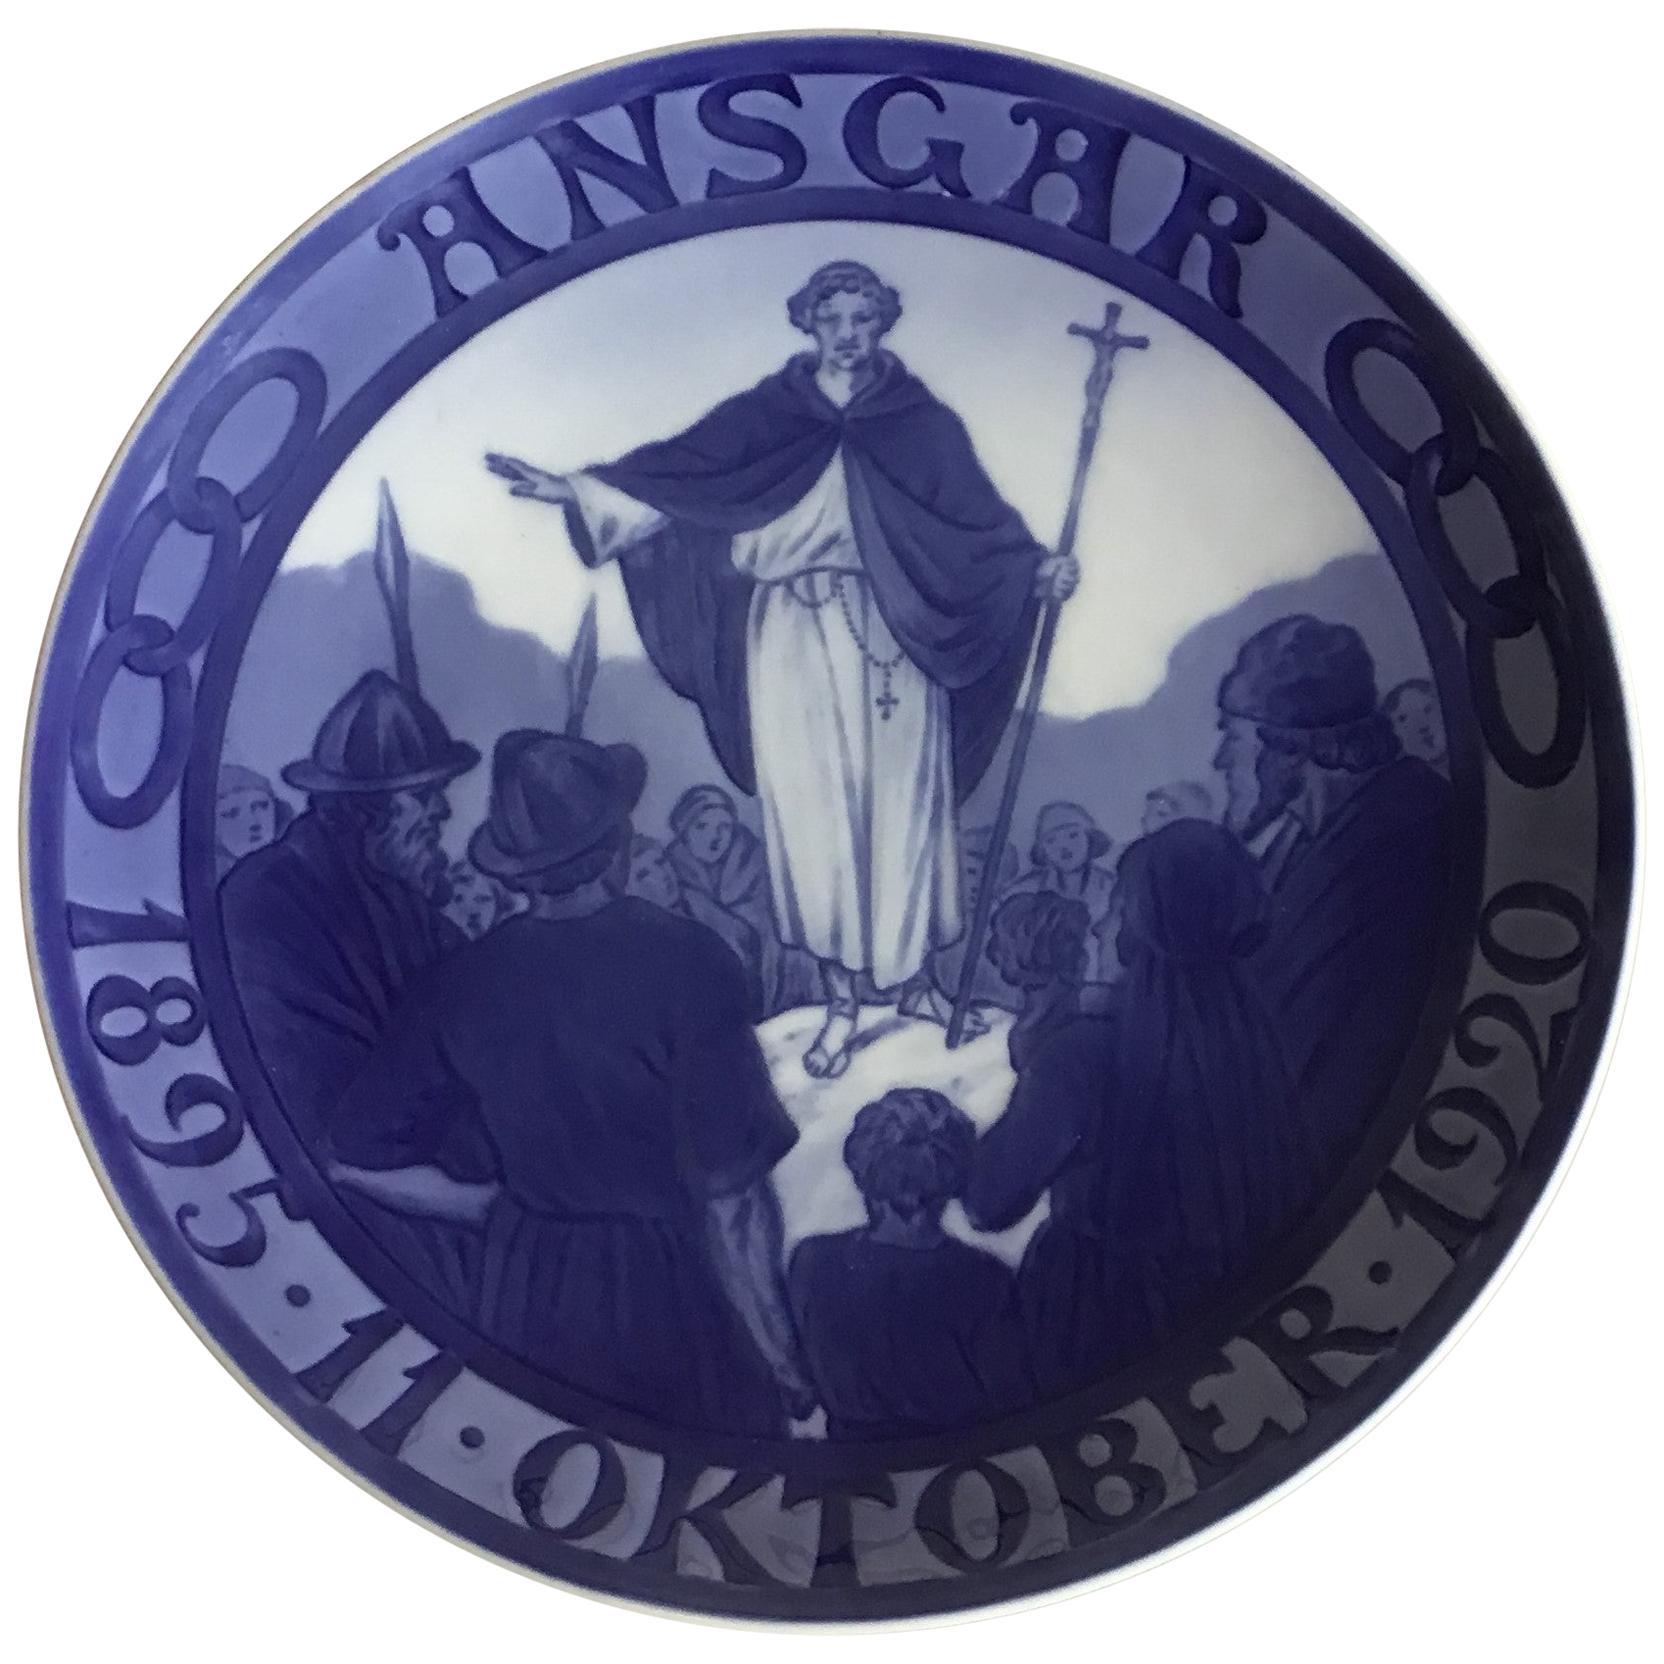 Royal Copenhagen Commemorative Plate from 1920 RC-CM194